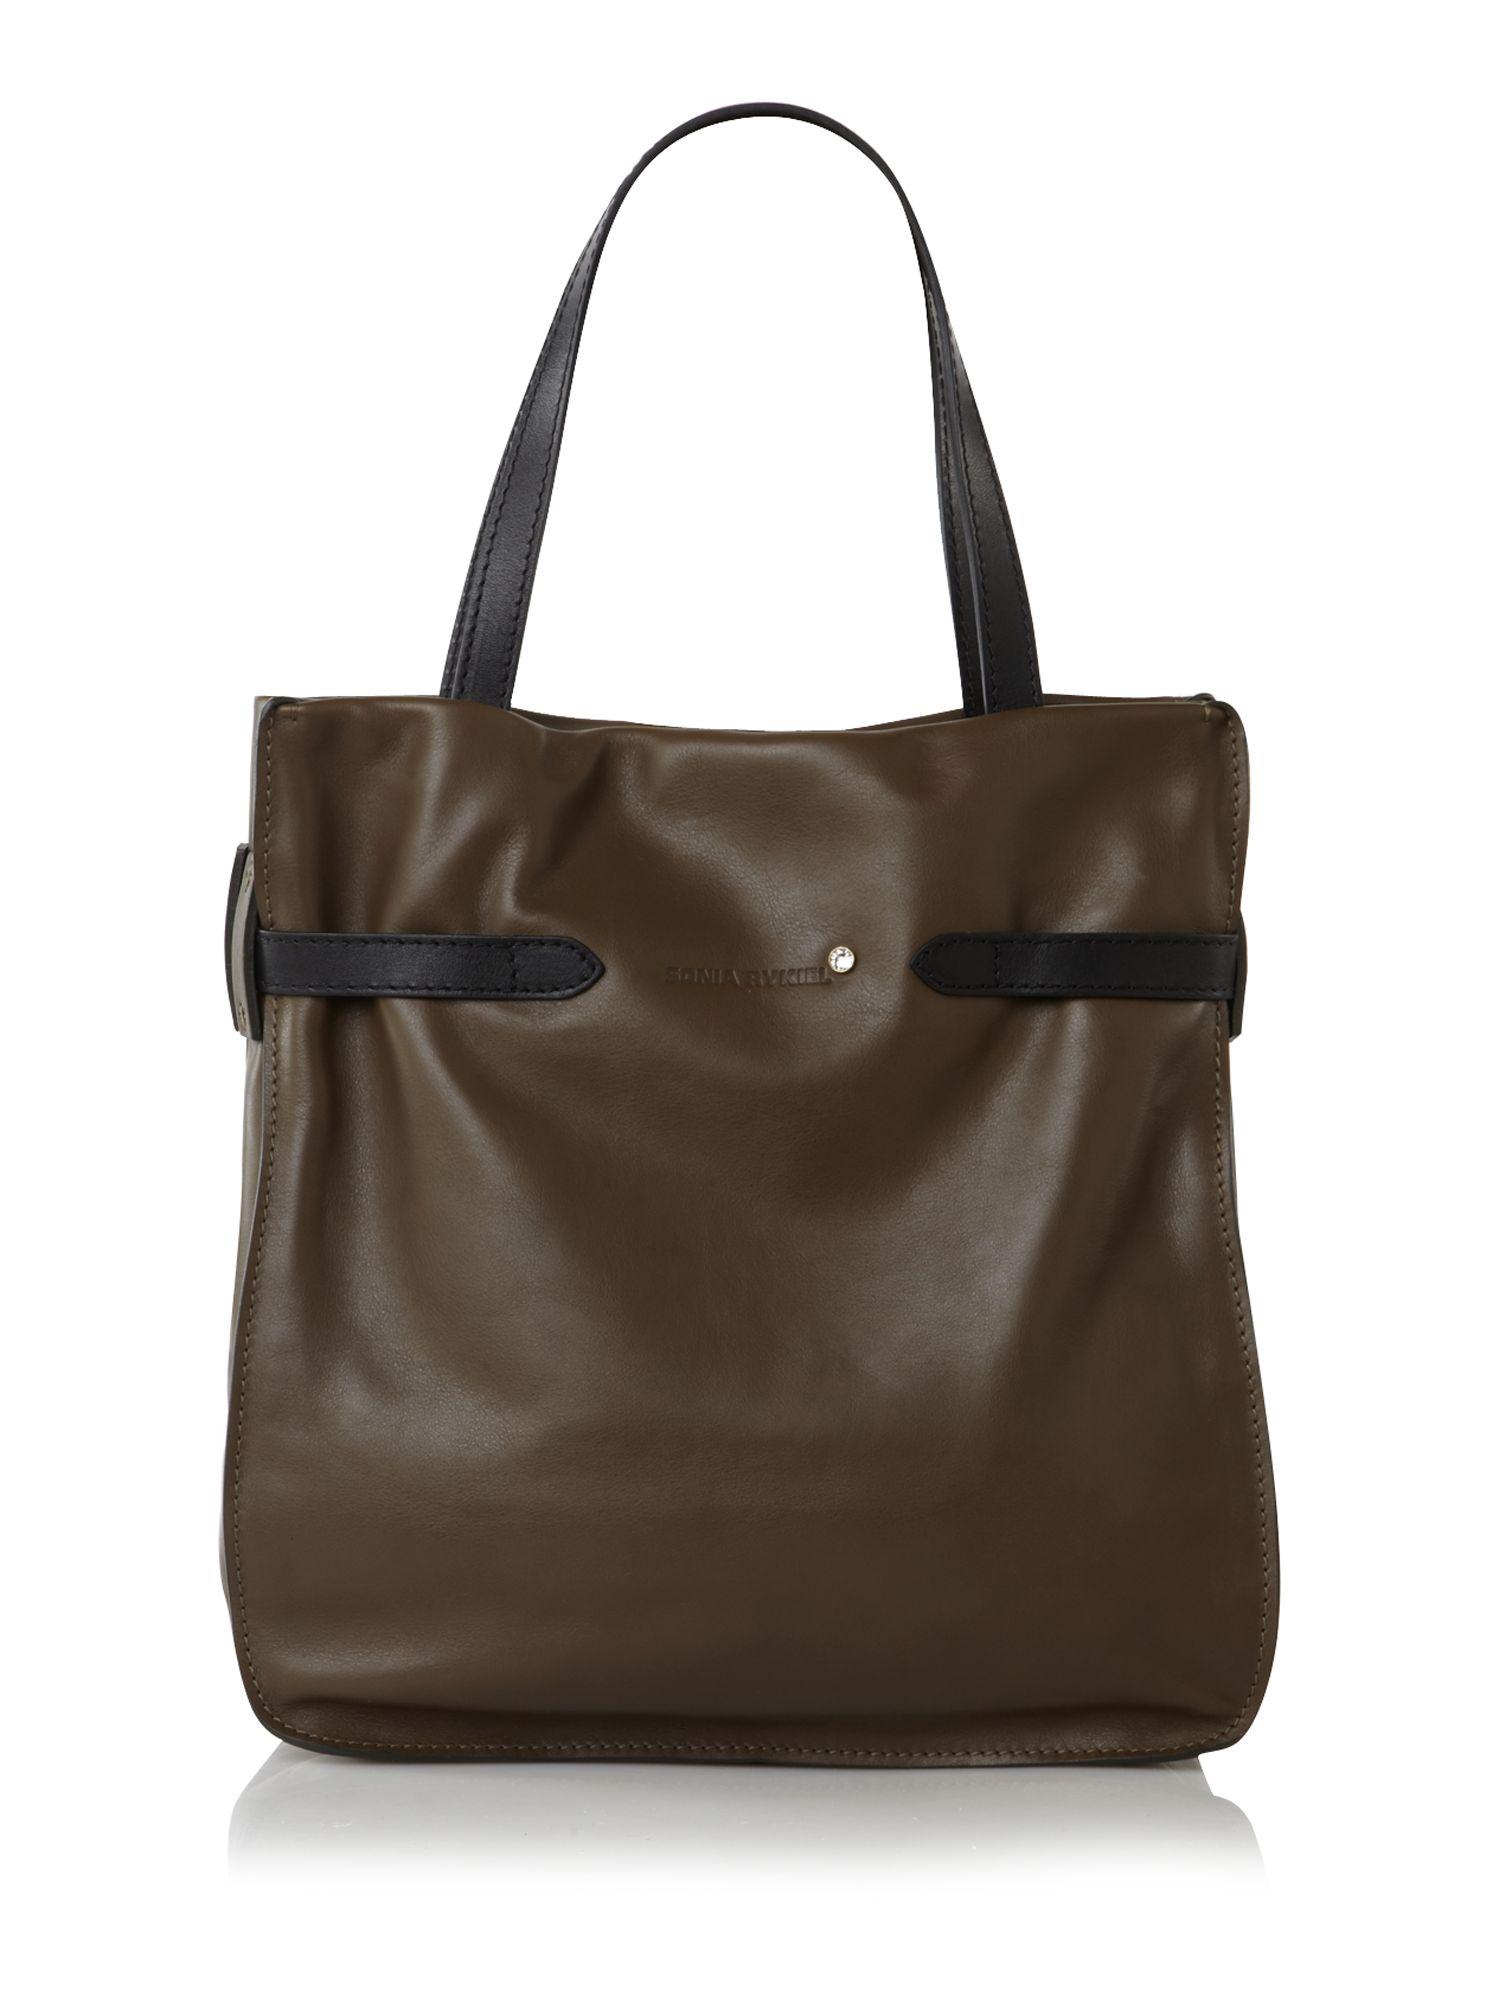 Sonia Rykiel Martha Tote in Grey (Brown)